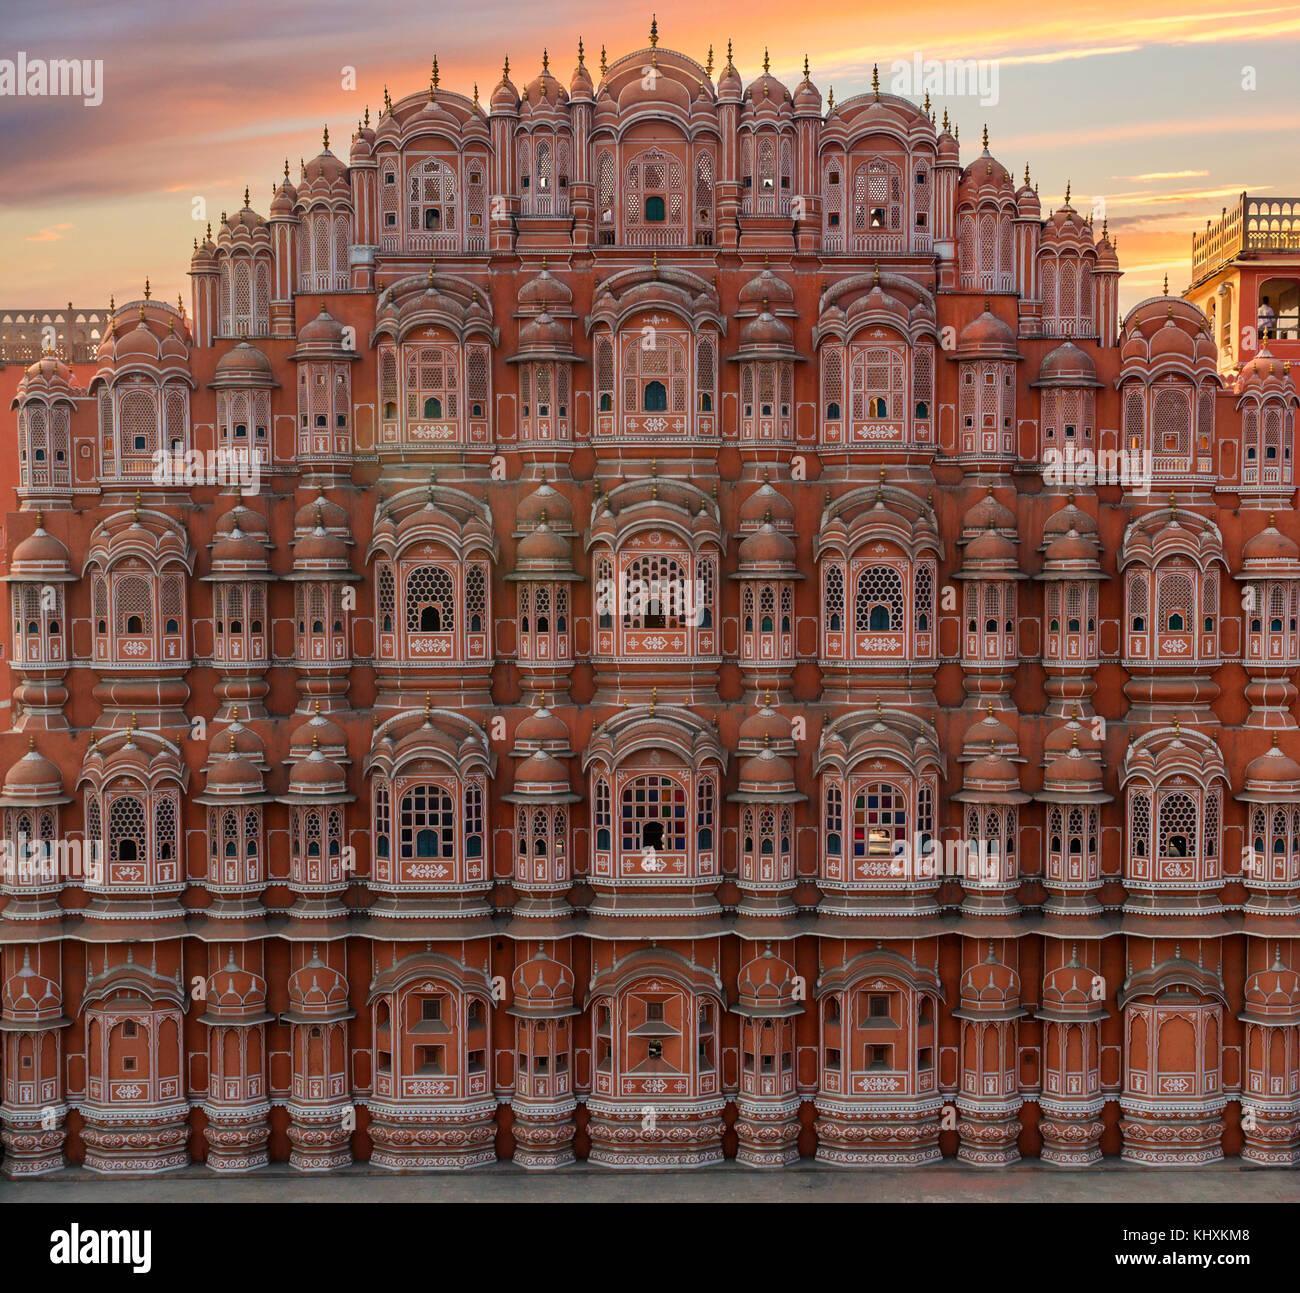 Pintoresca vista del atardecer al Hawa Mahal en Jaipur, India Imagen De Stock